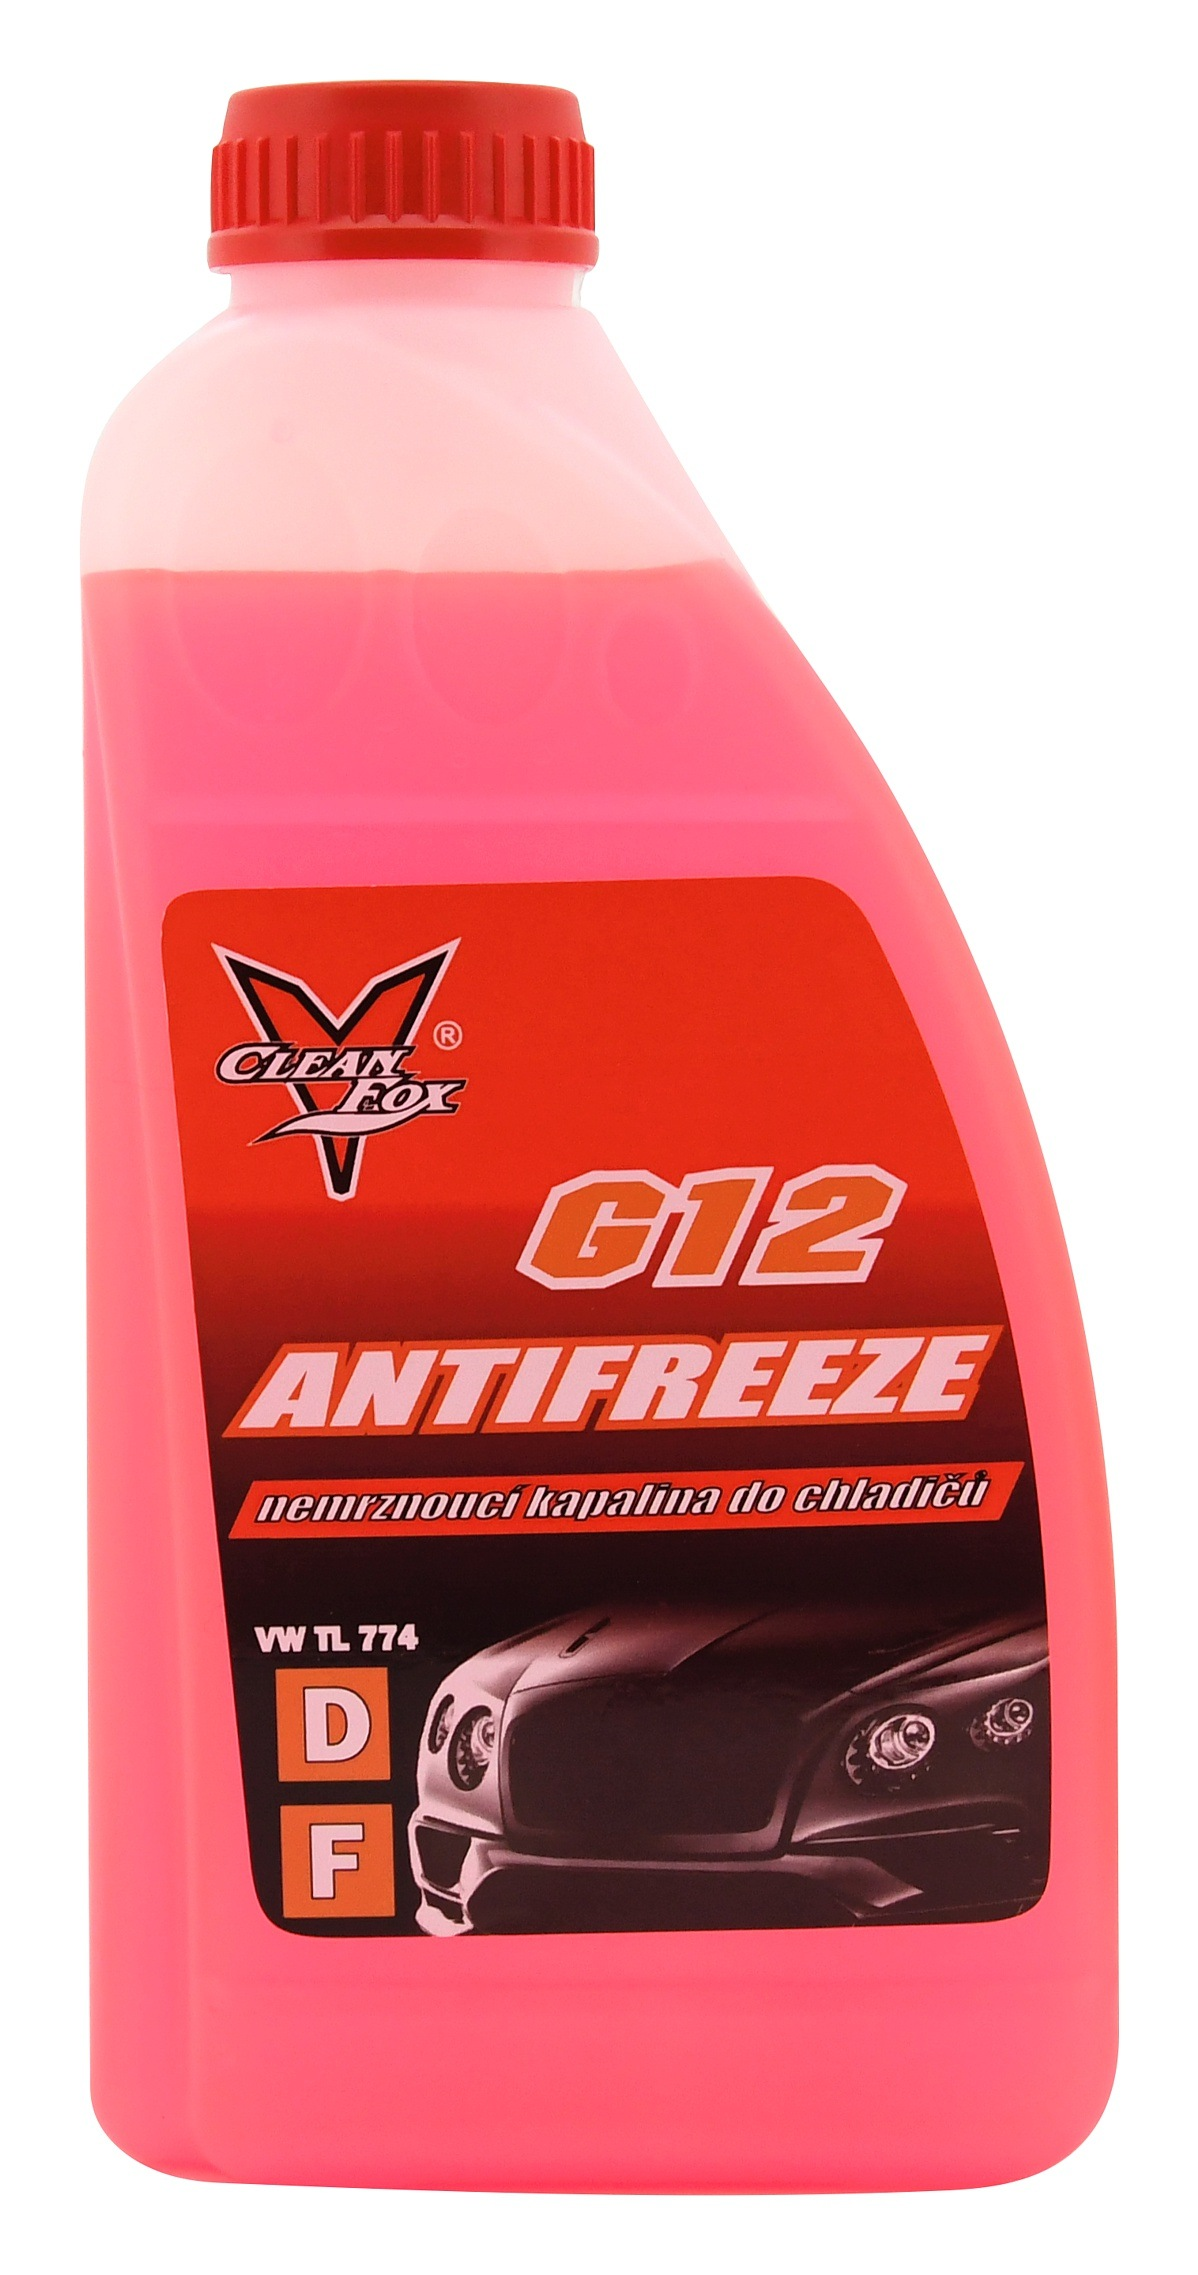 Antifreeze G12, 1L